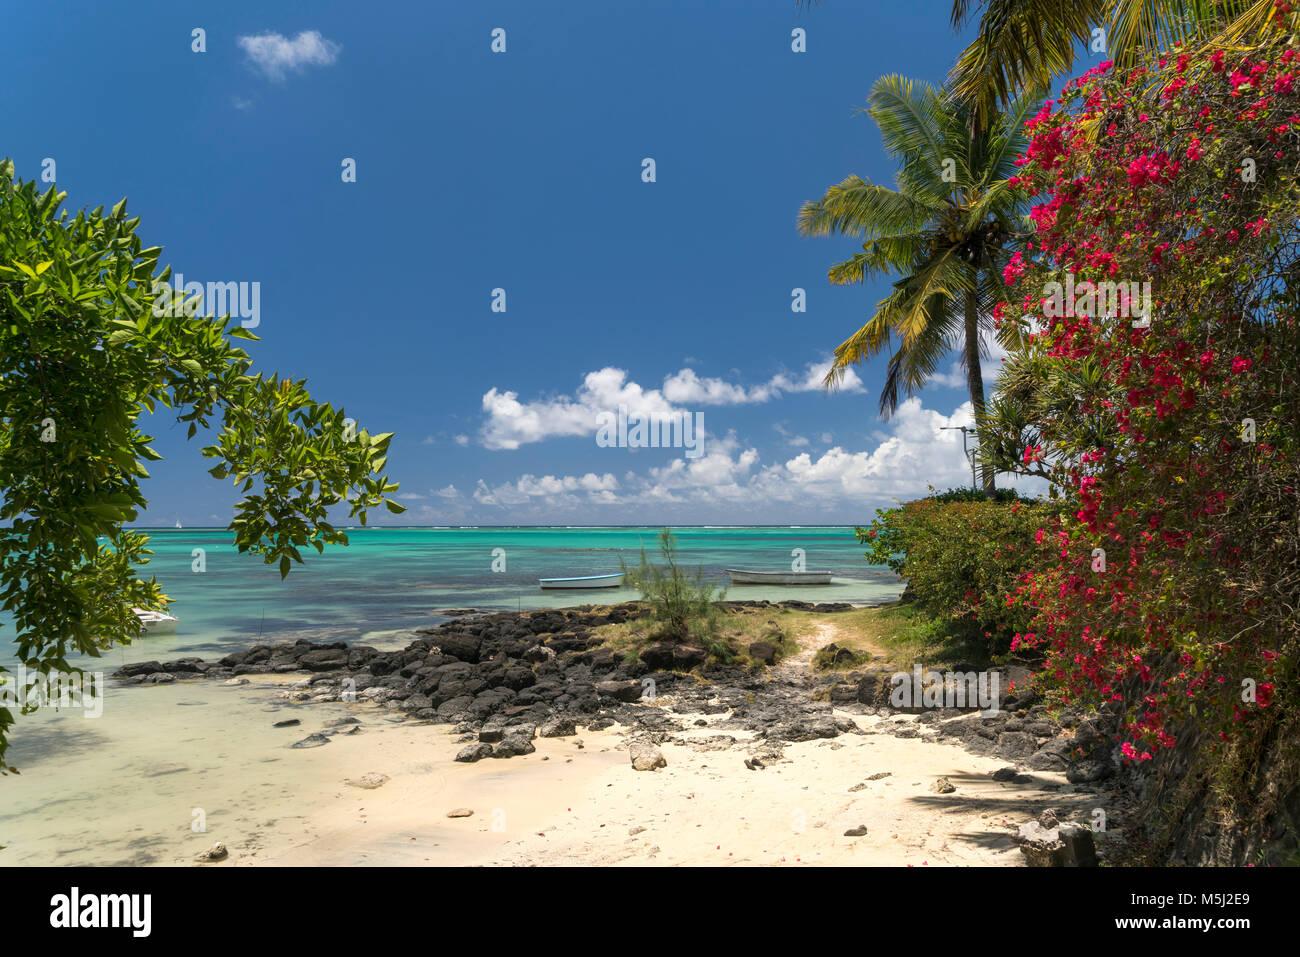 Bougainvillea am Bain Boeuf Public Beach, Cap Malheureux, Riviere du Rempart  Mauritius, Afrika,  | Bougainvillea - Stock Image